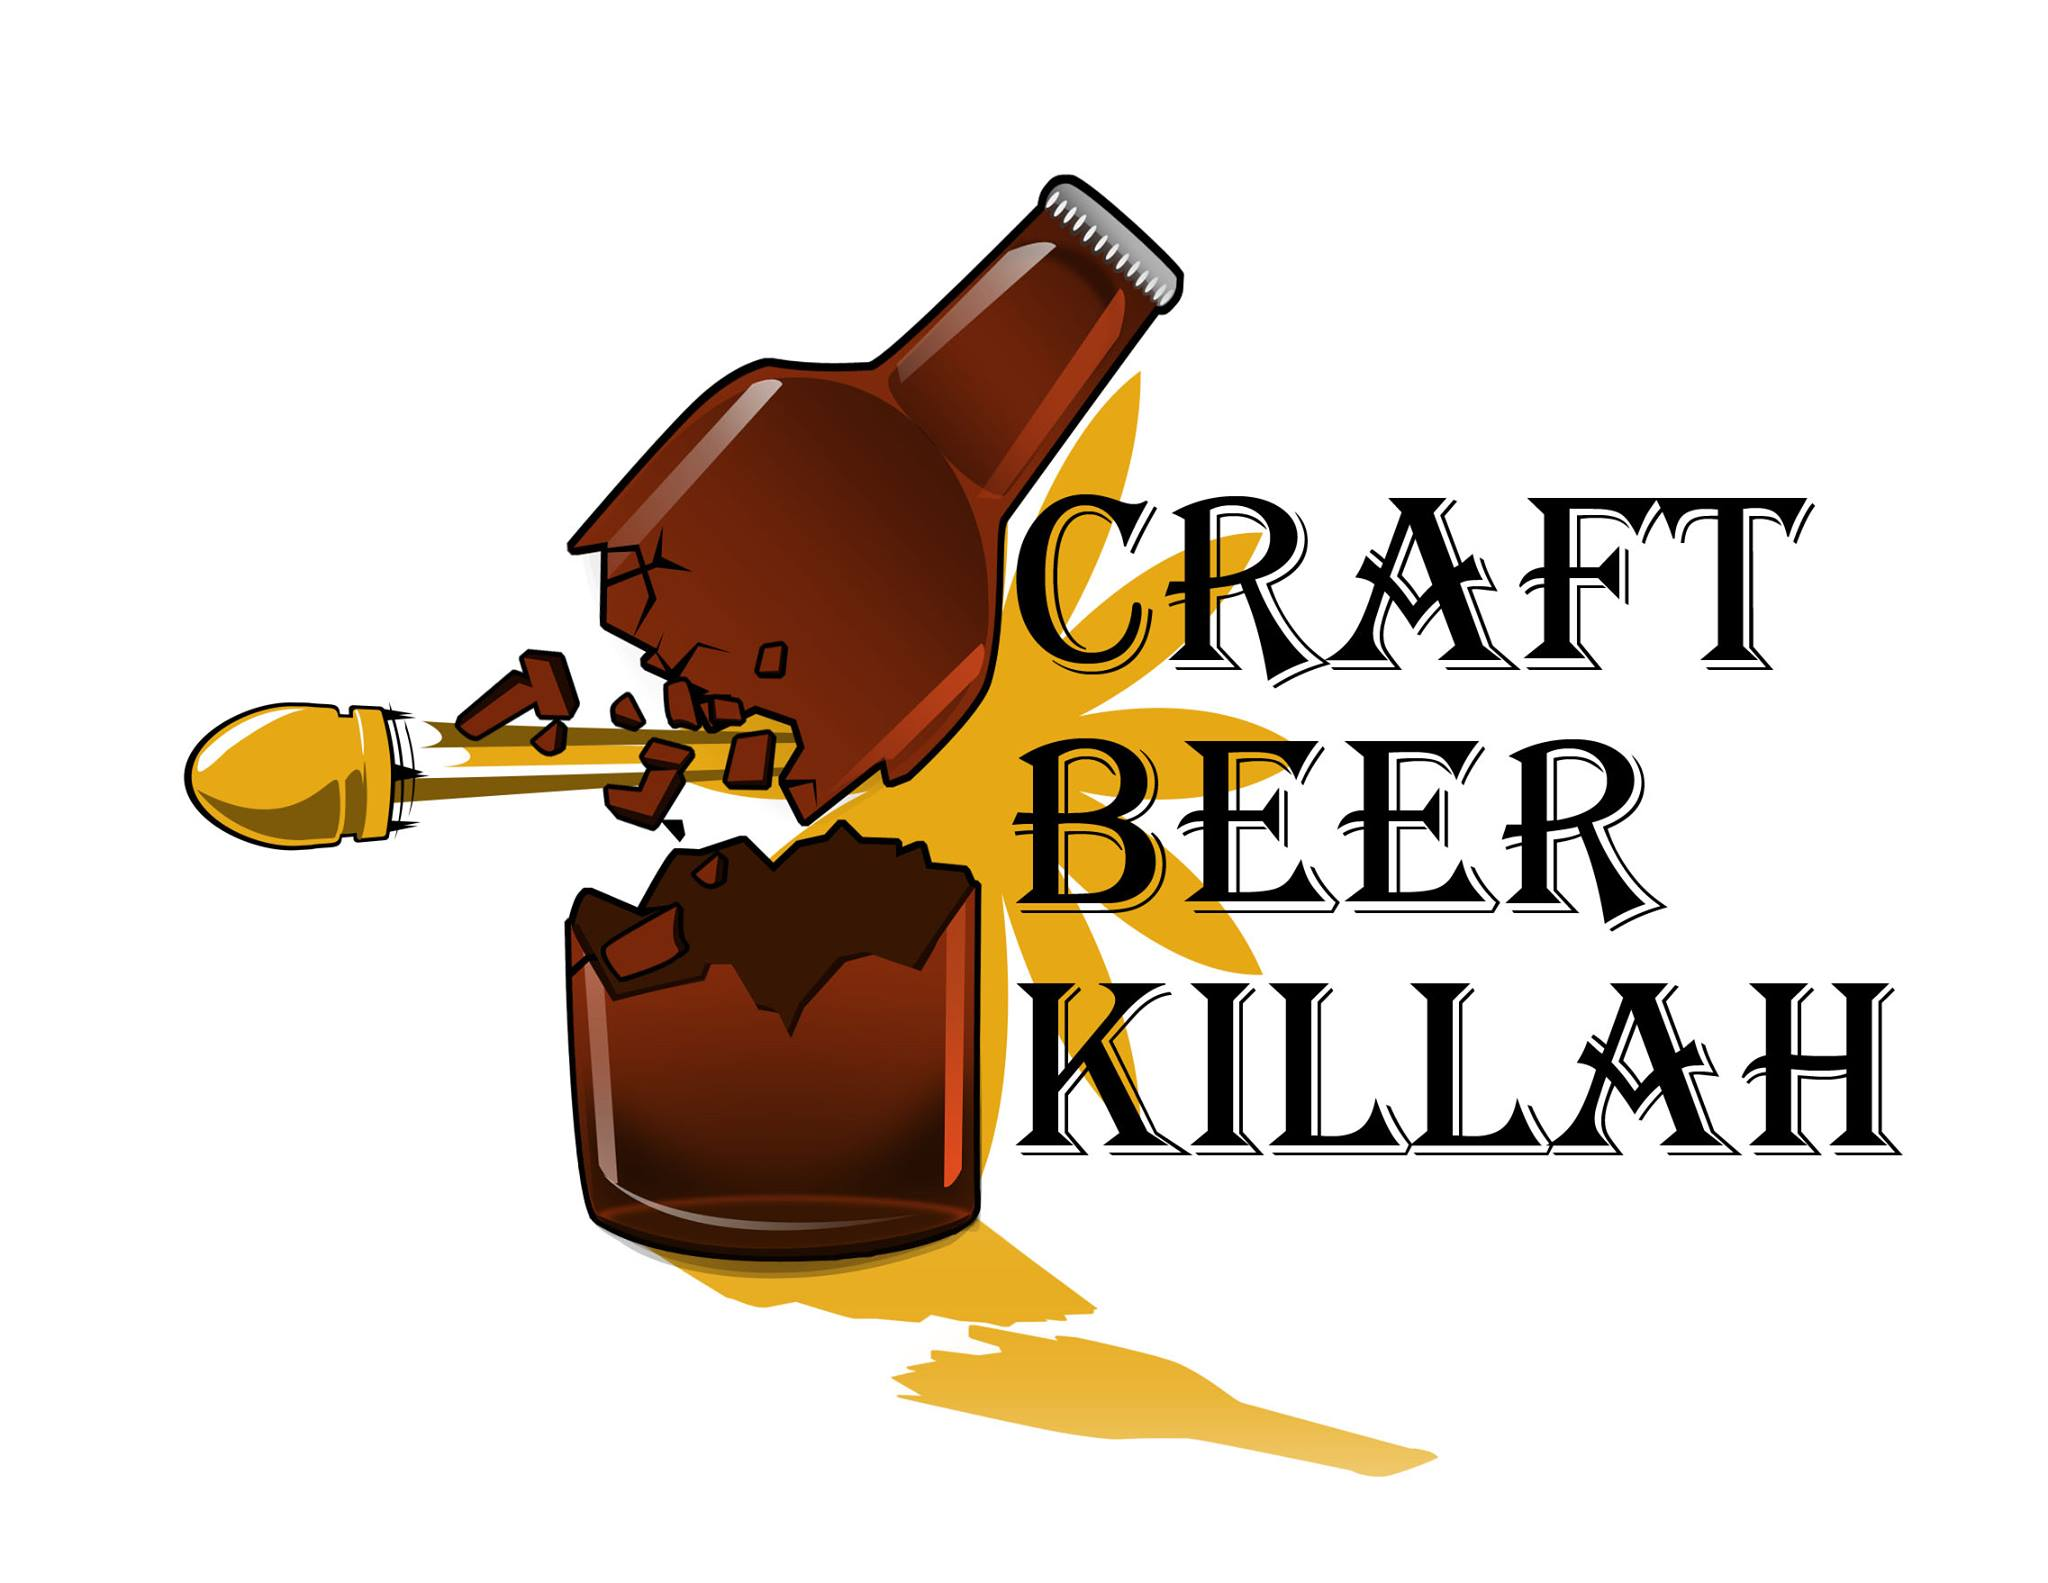 www.craftbeerkillah.com